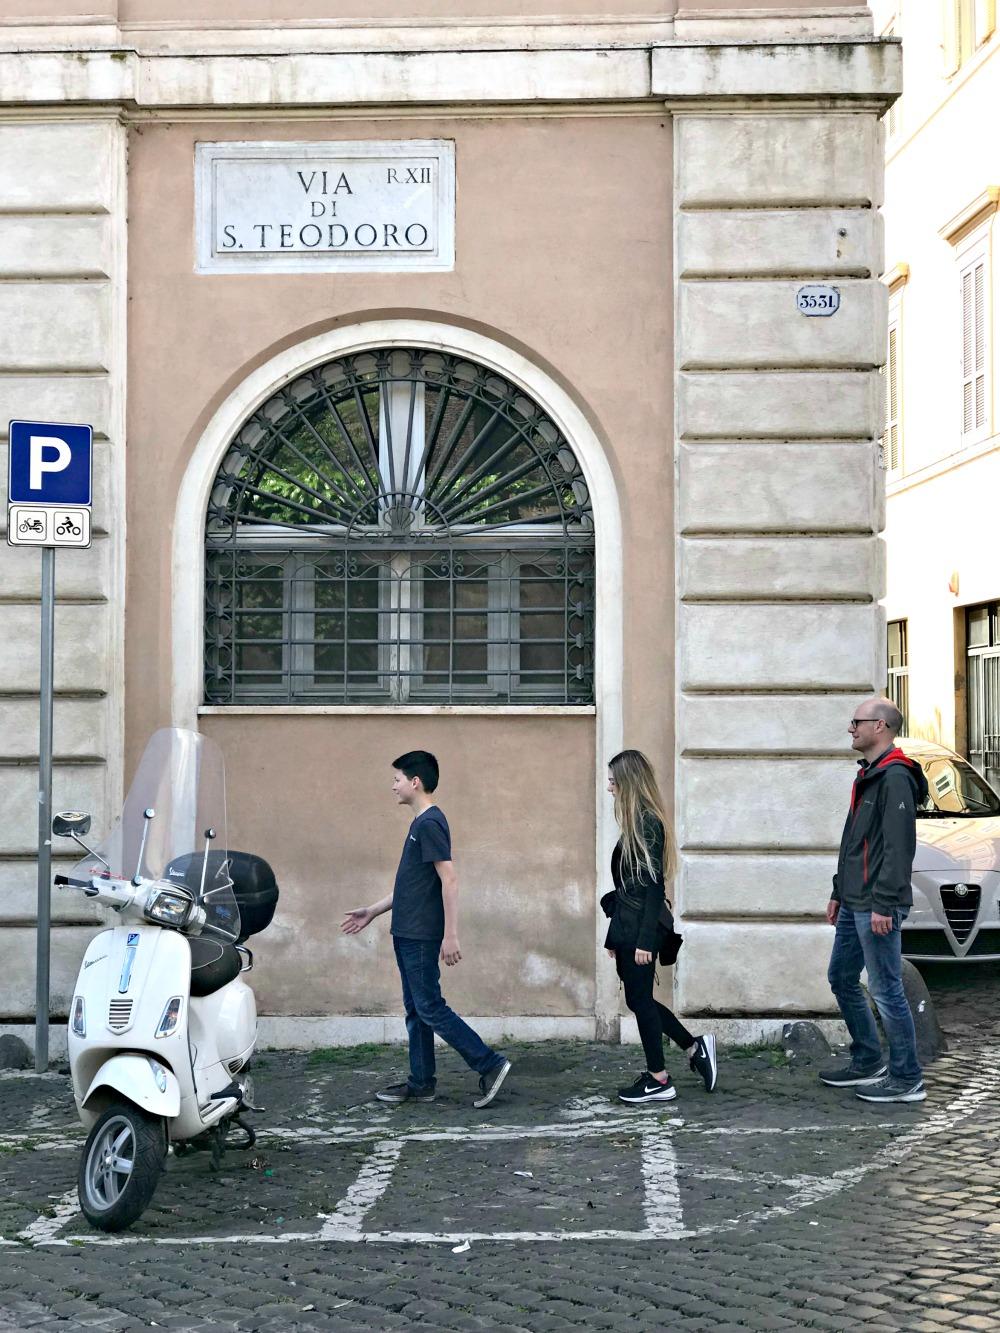 Via di S Teodoro street in Rome